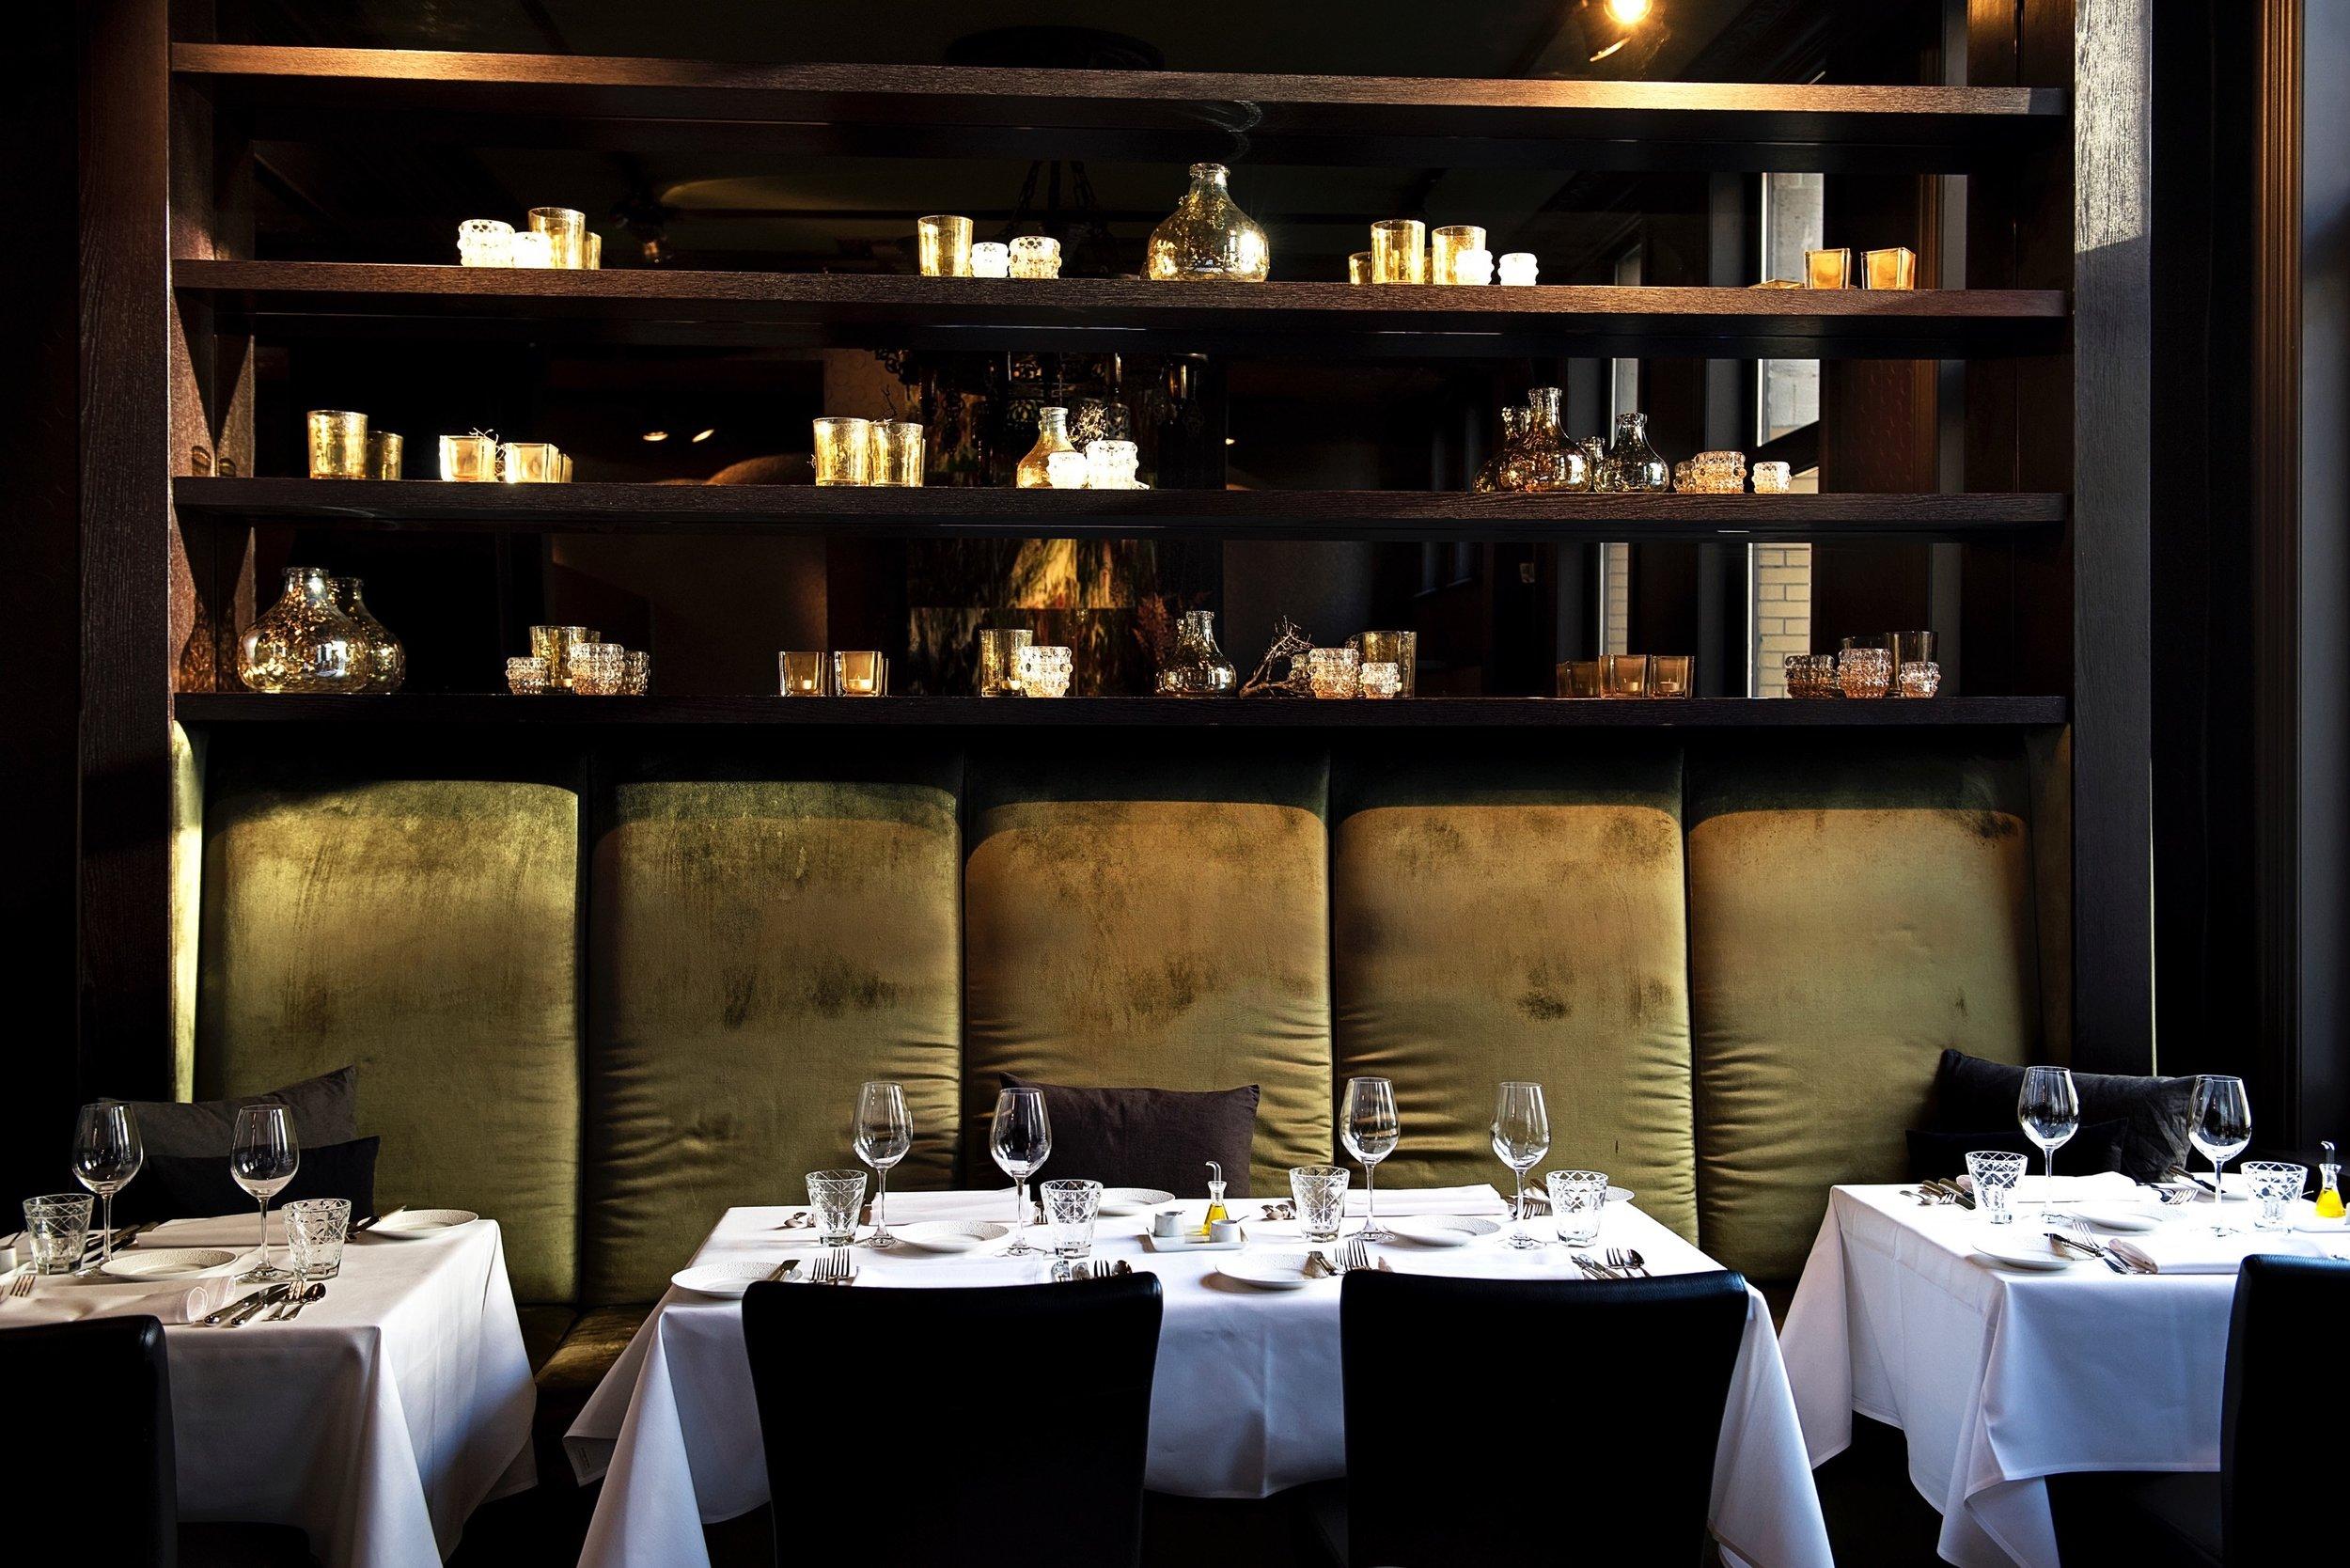 4 michelin restaurant the glorious antwerpen tablefever bart albrecht.jpg